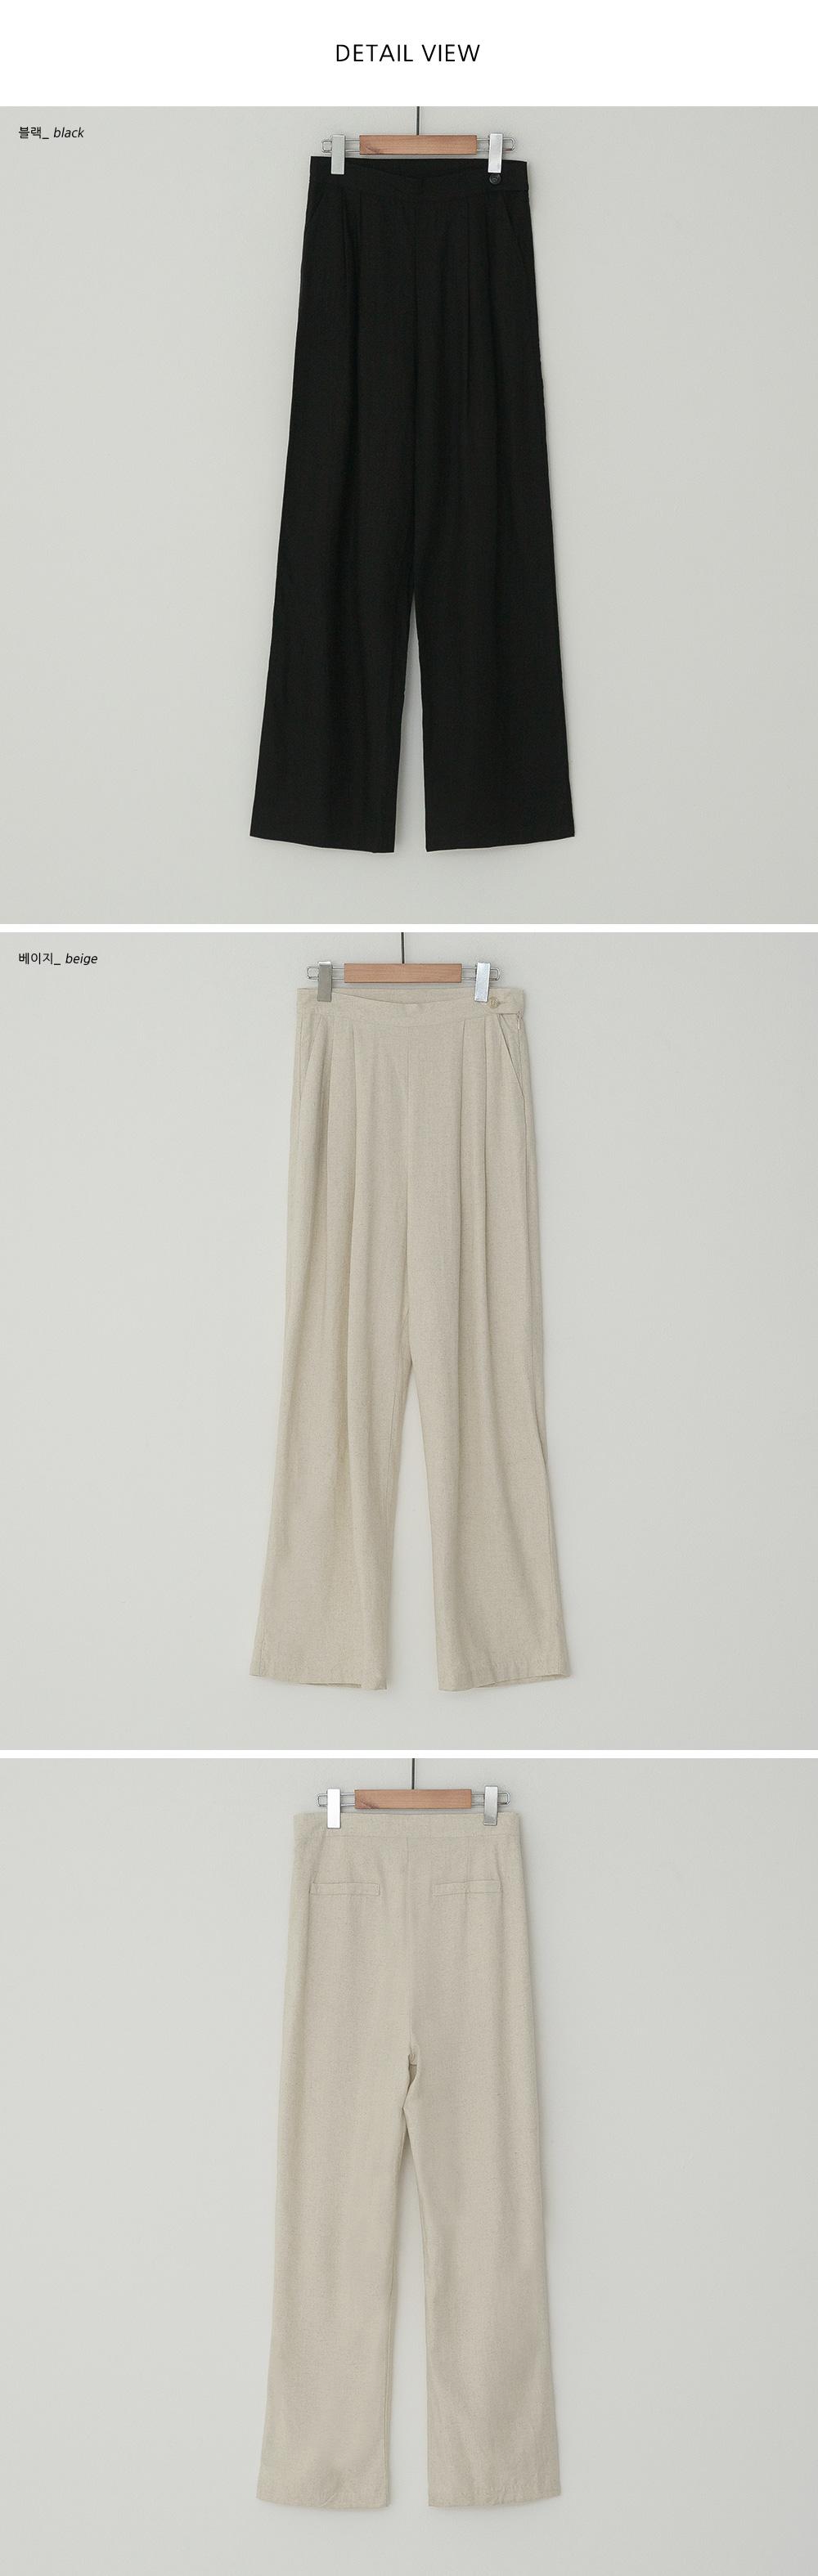 Rosie Two Pin Tuck Wide Linen Slacks